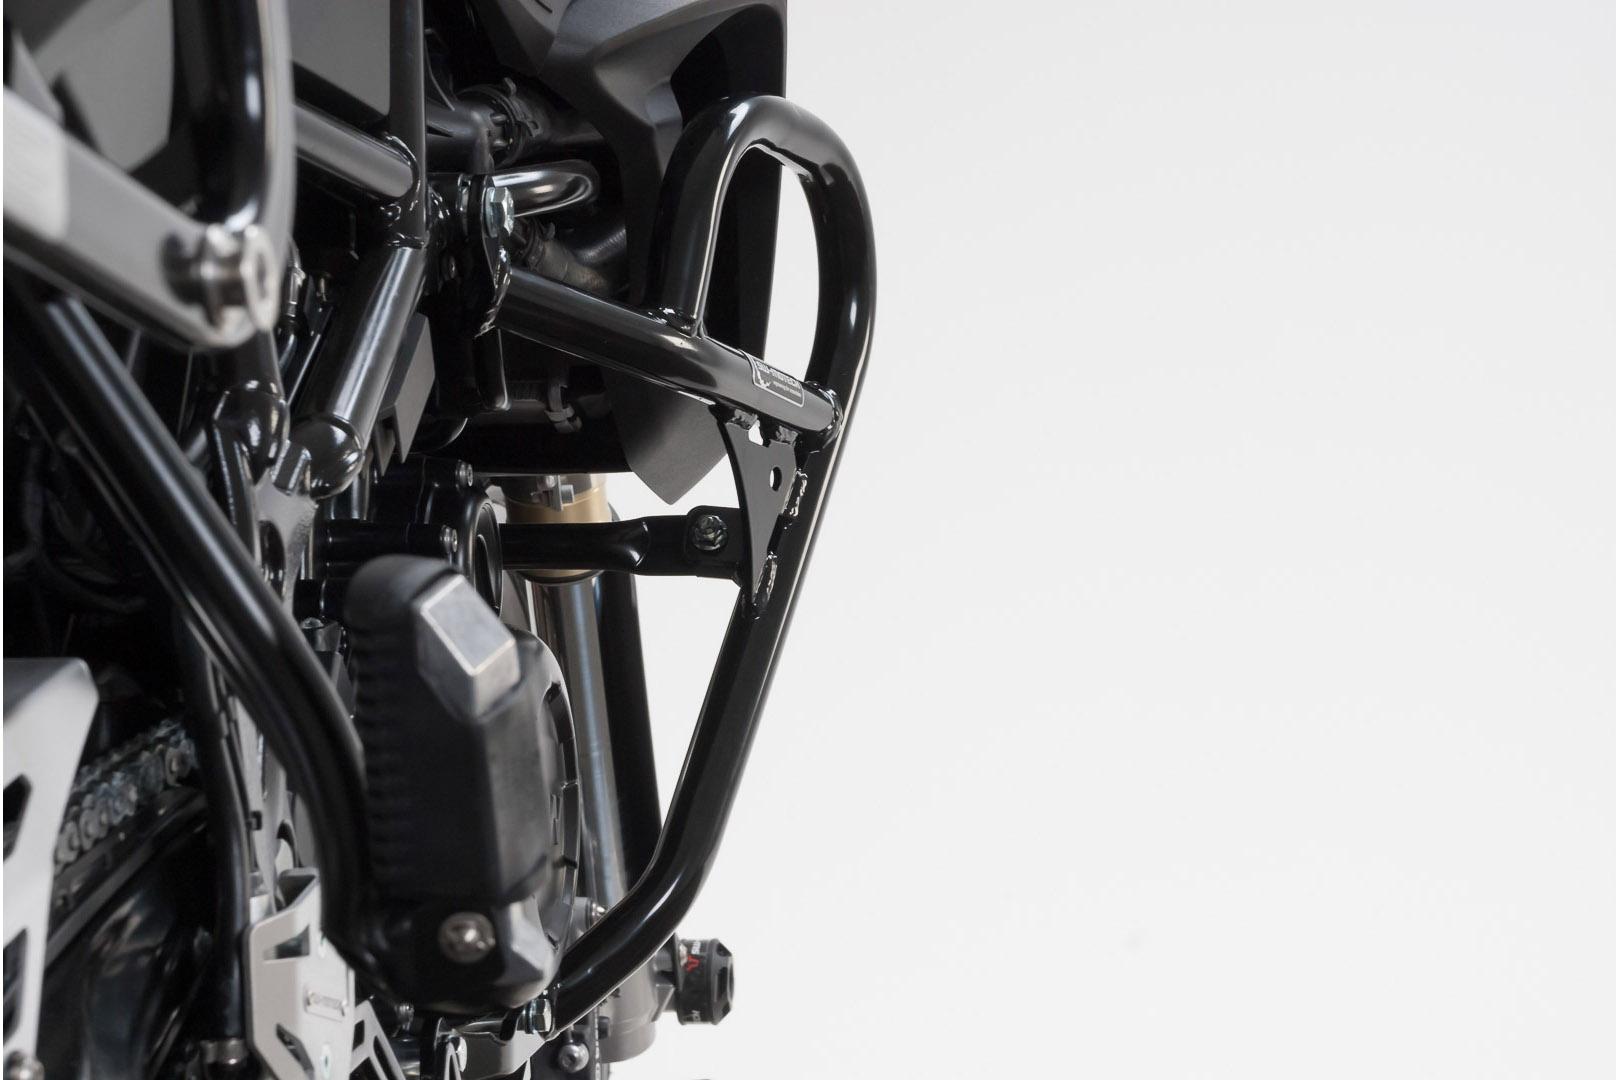 SW-Motech Moottorinsuojarauta BMW F650GS 08-/F700GS/F800GS musta